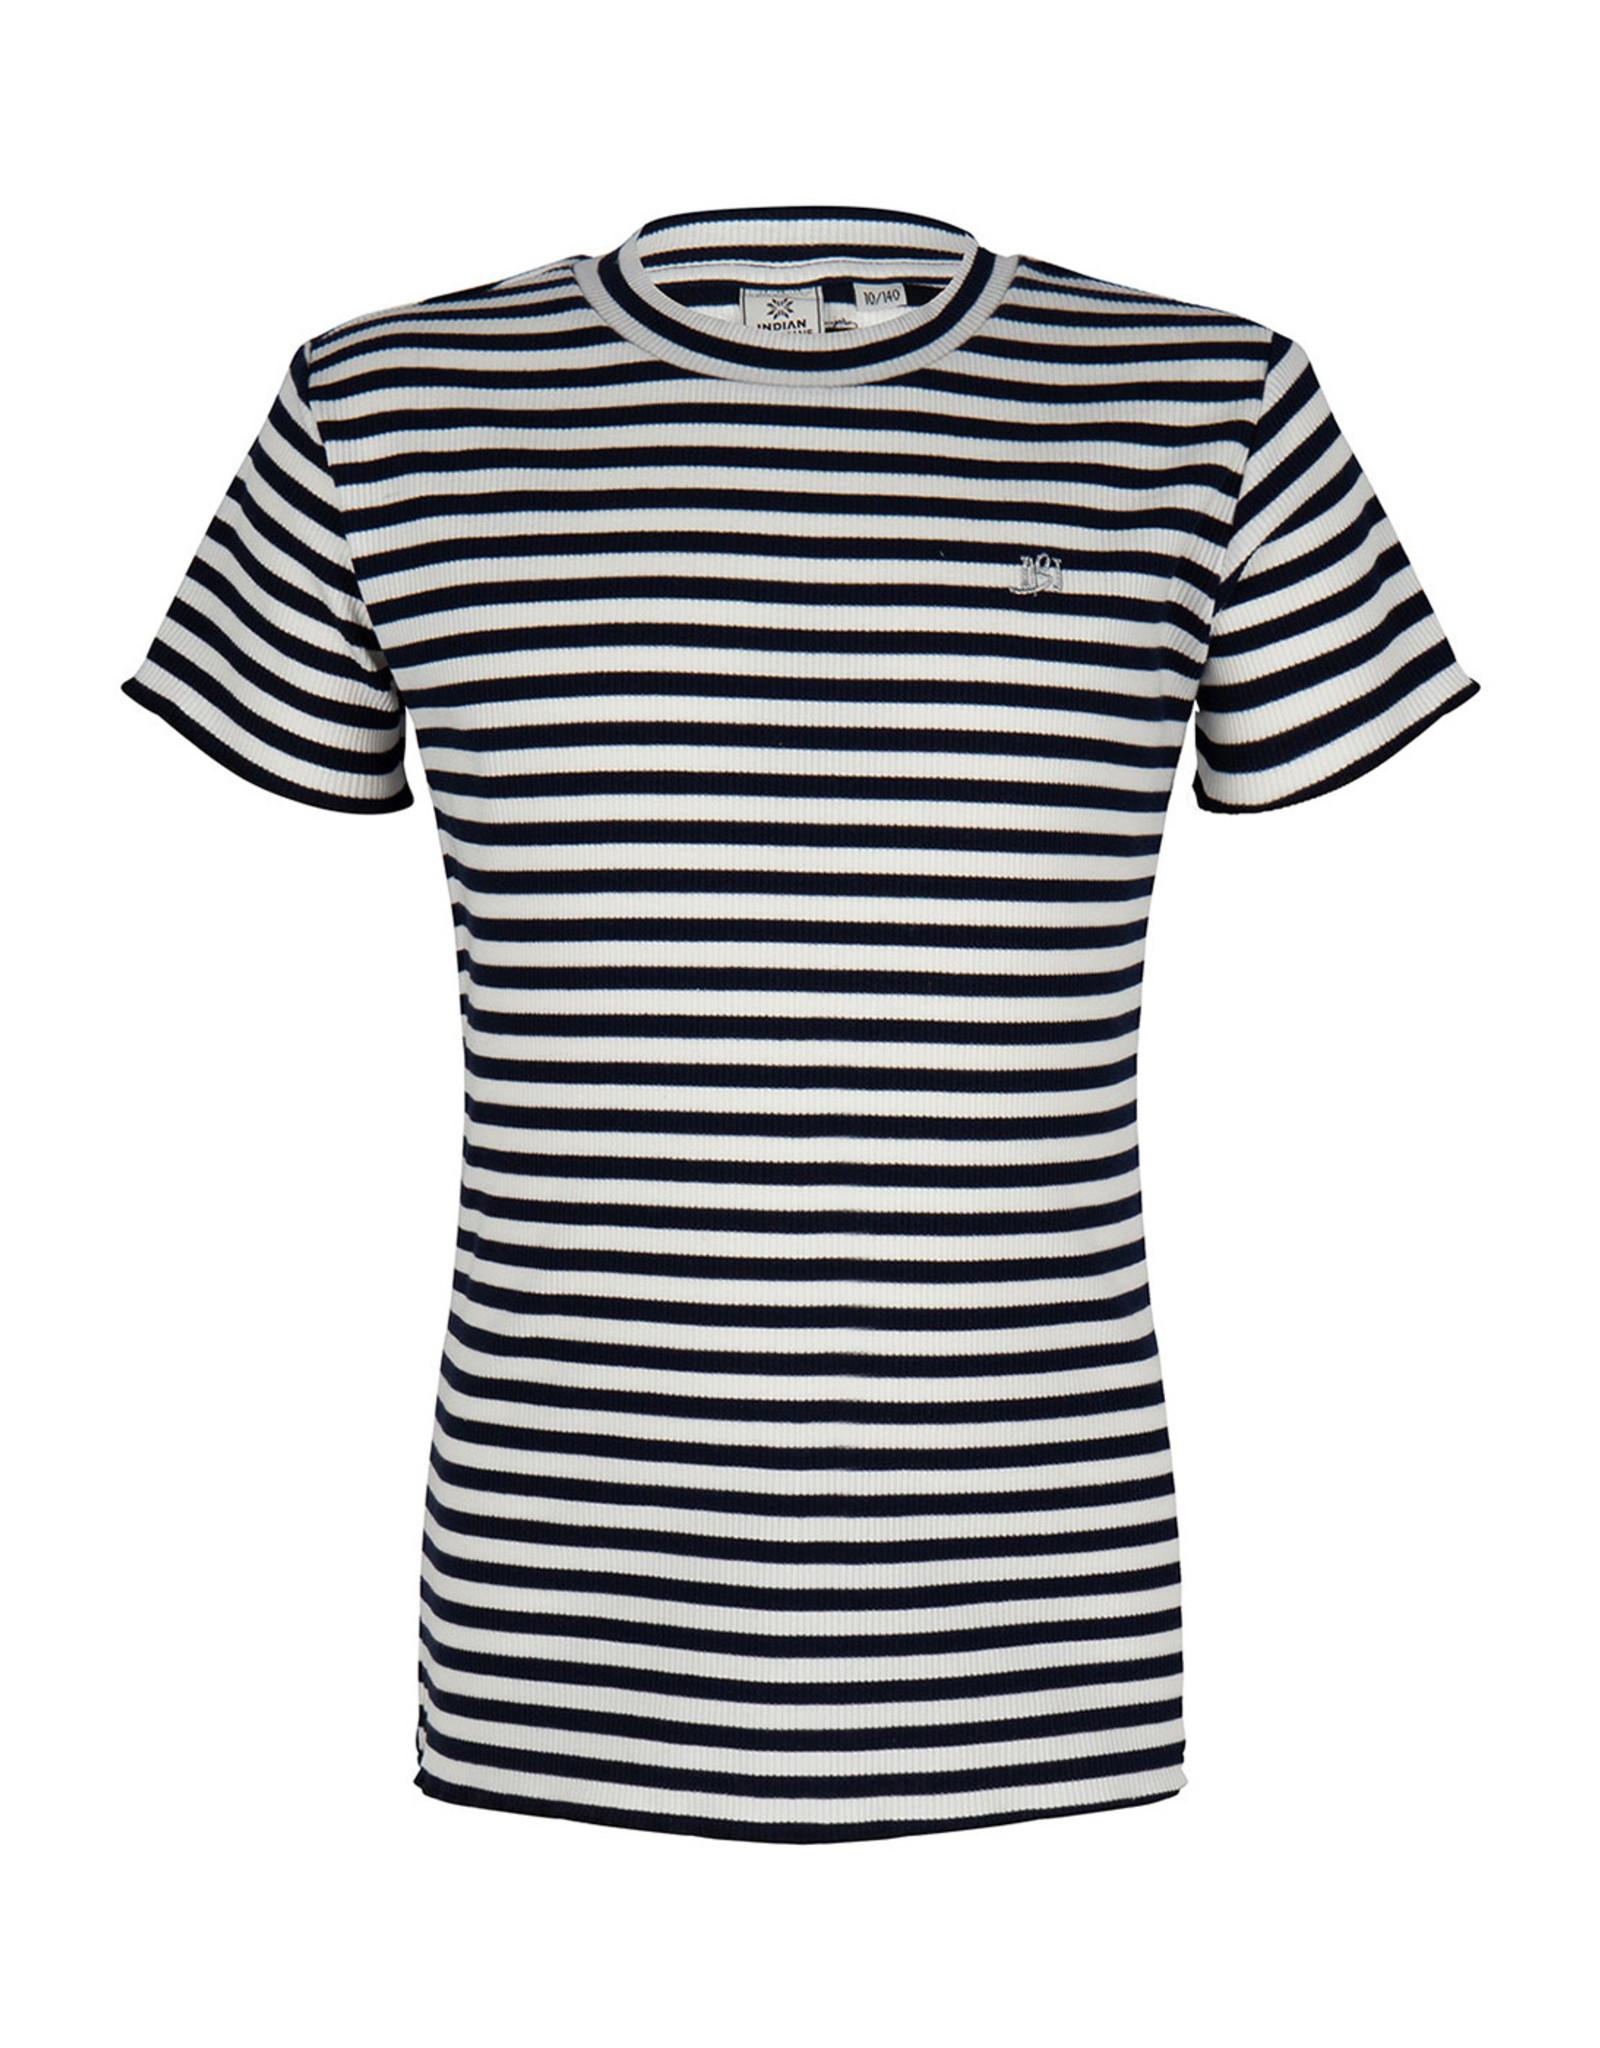 Indian Blue Jeans IBJ gestreept t-shirt wit/navy